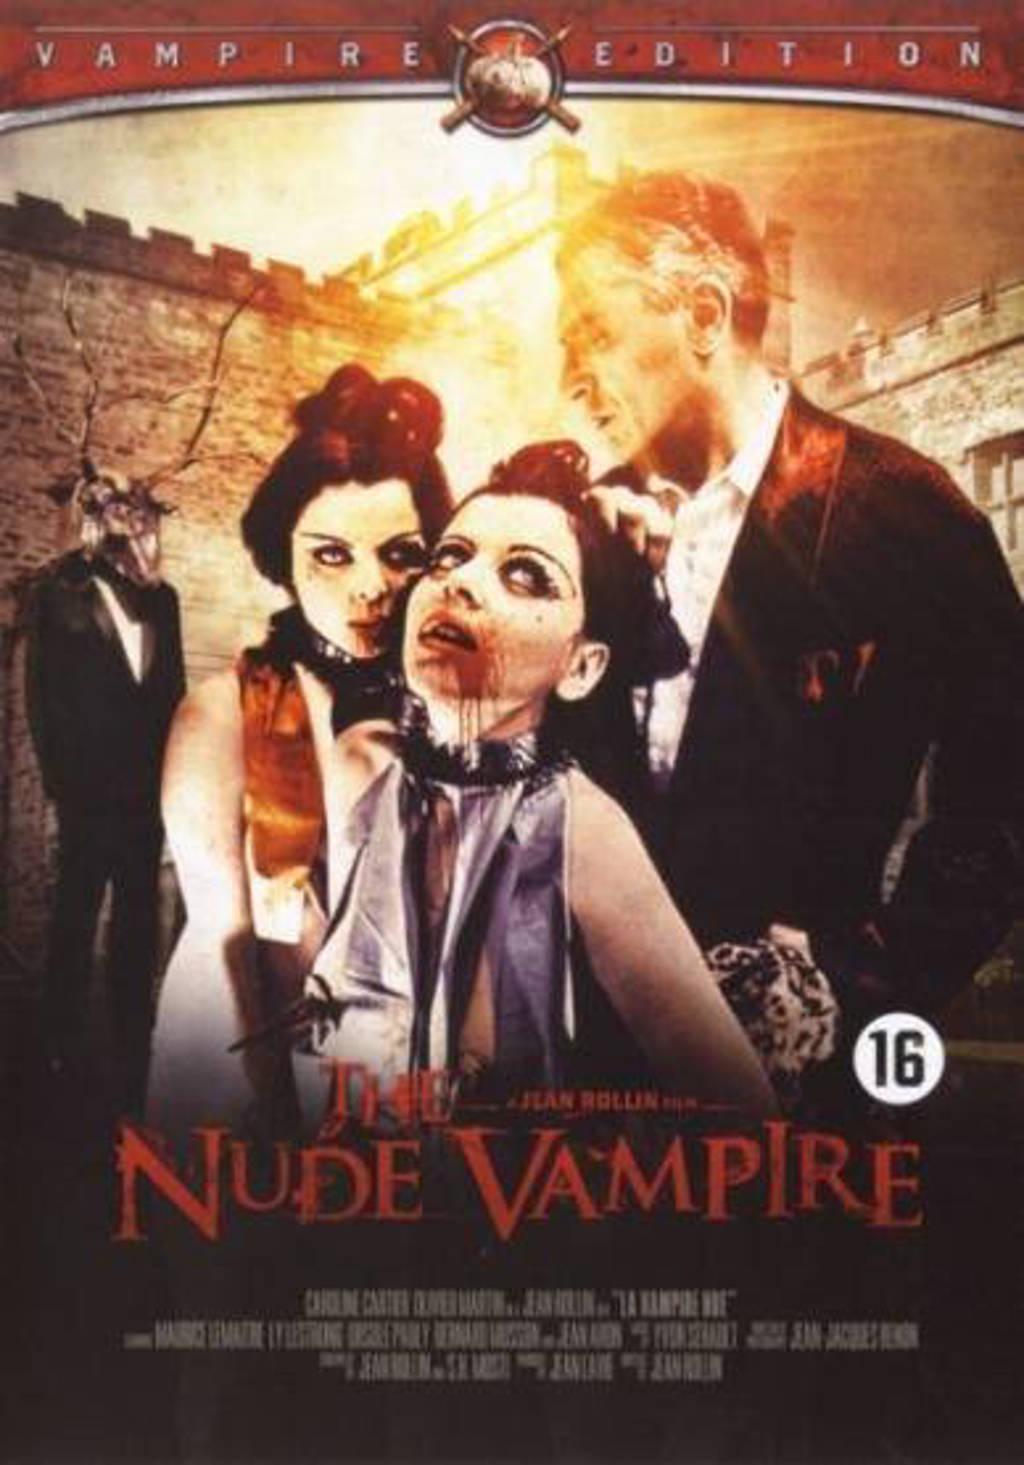 Nude vampire (DVD)